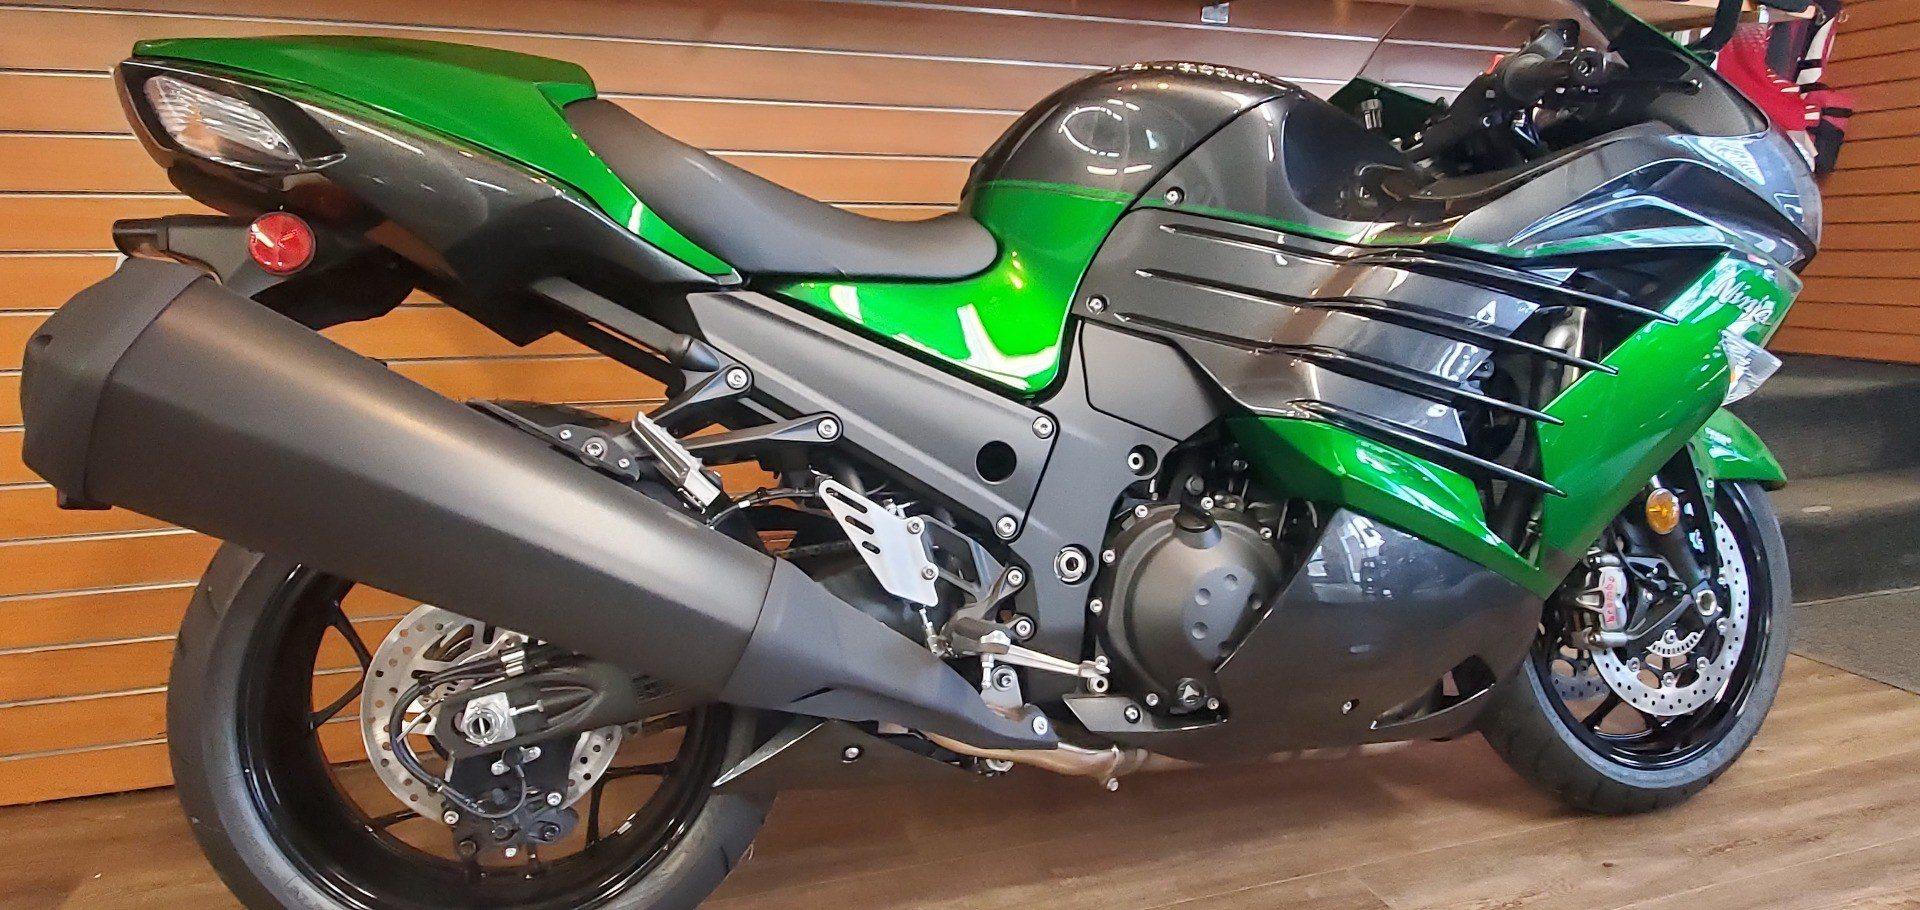 2018 Kawasaki Ninja Zx 14r Abs Se In Ledgewood New Jersey